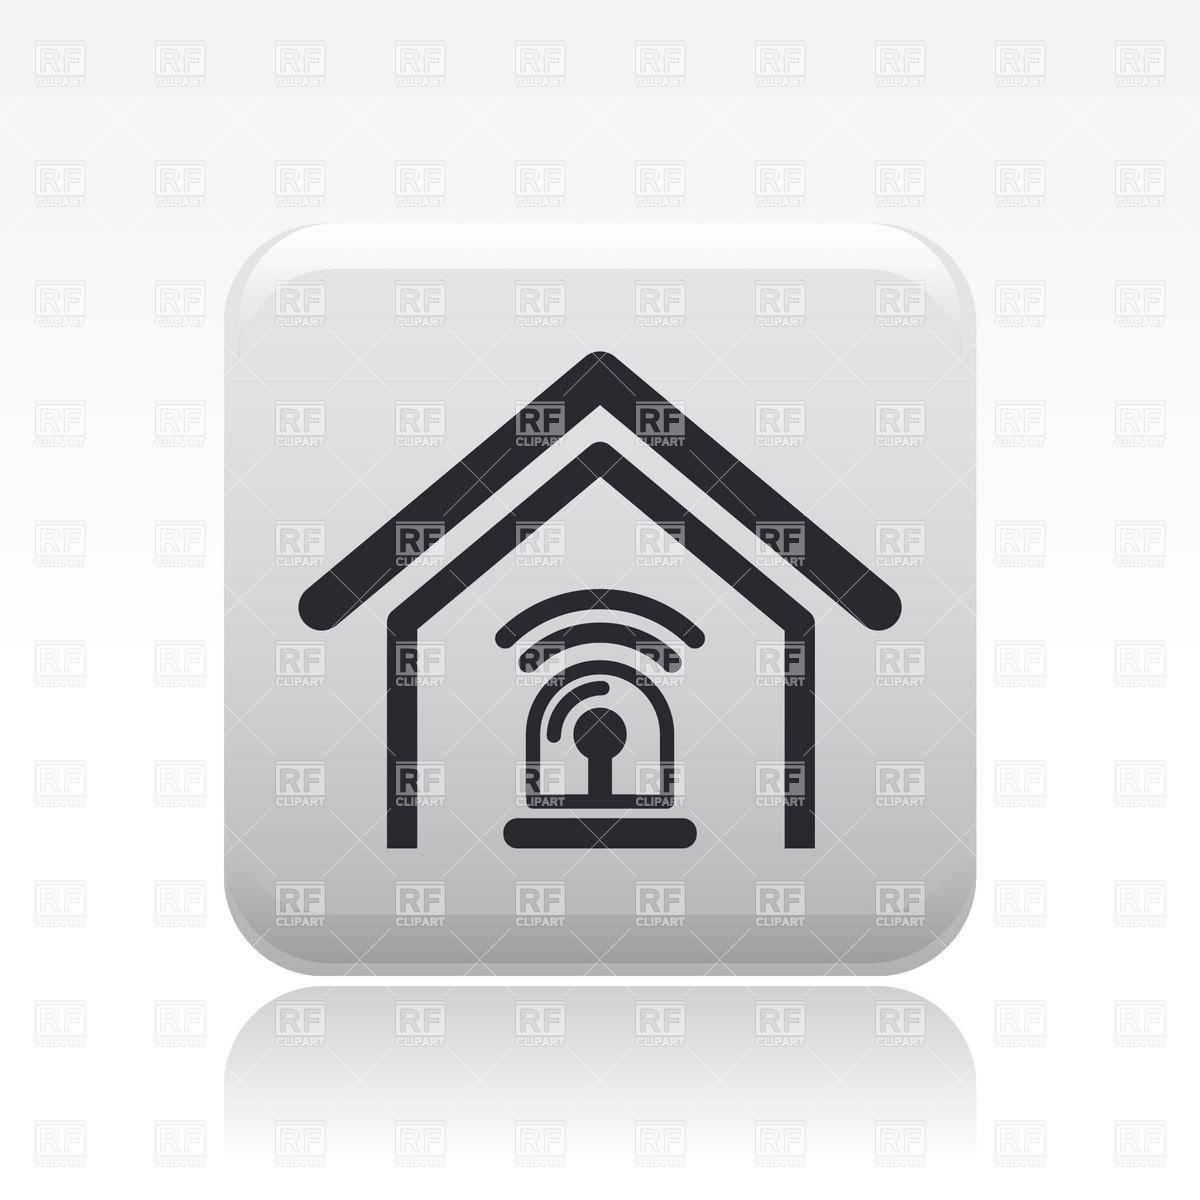 Home Alarm System Clip Art.